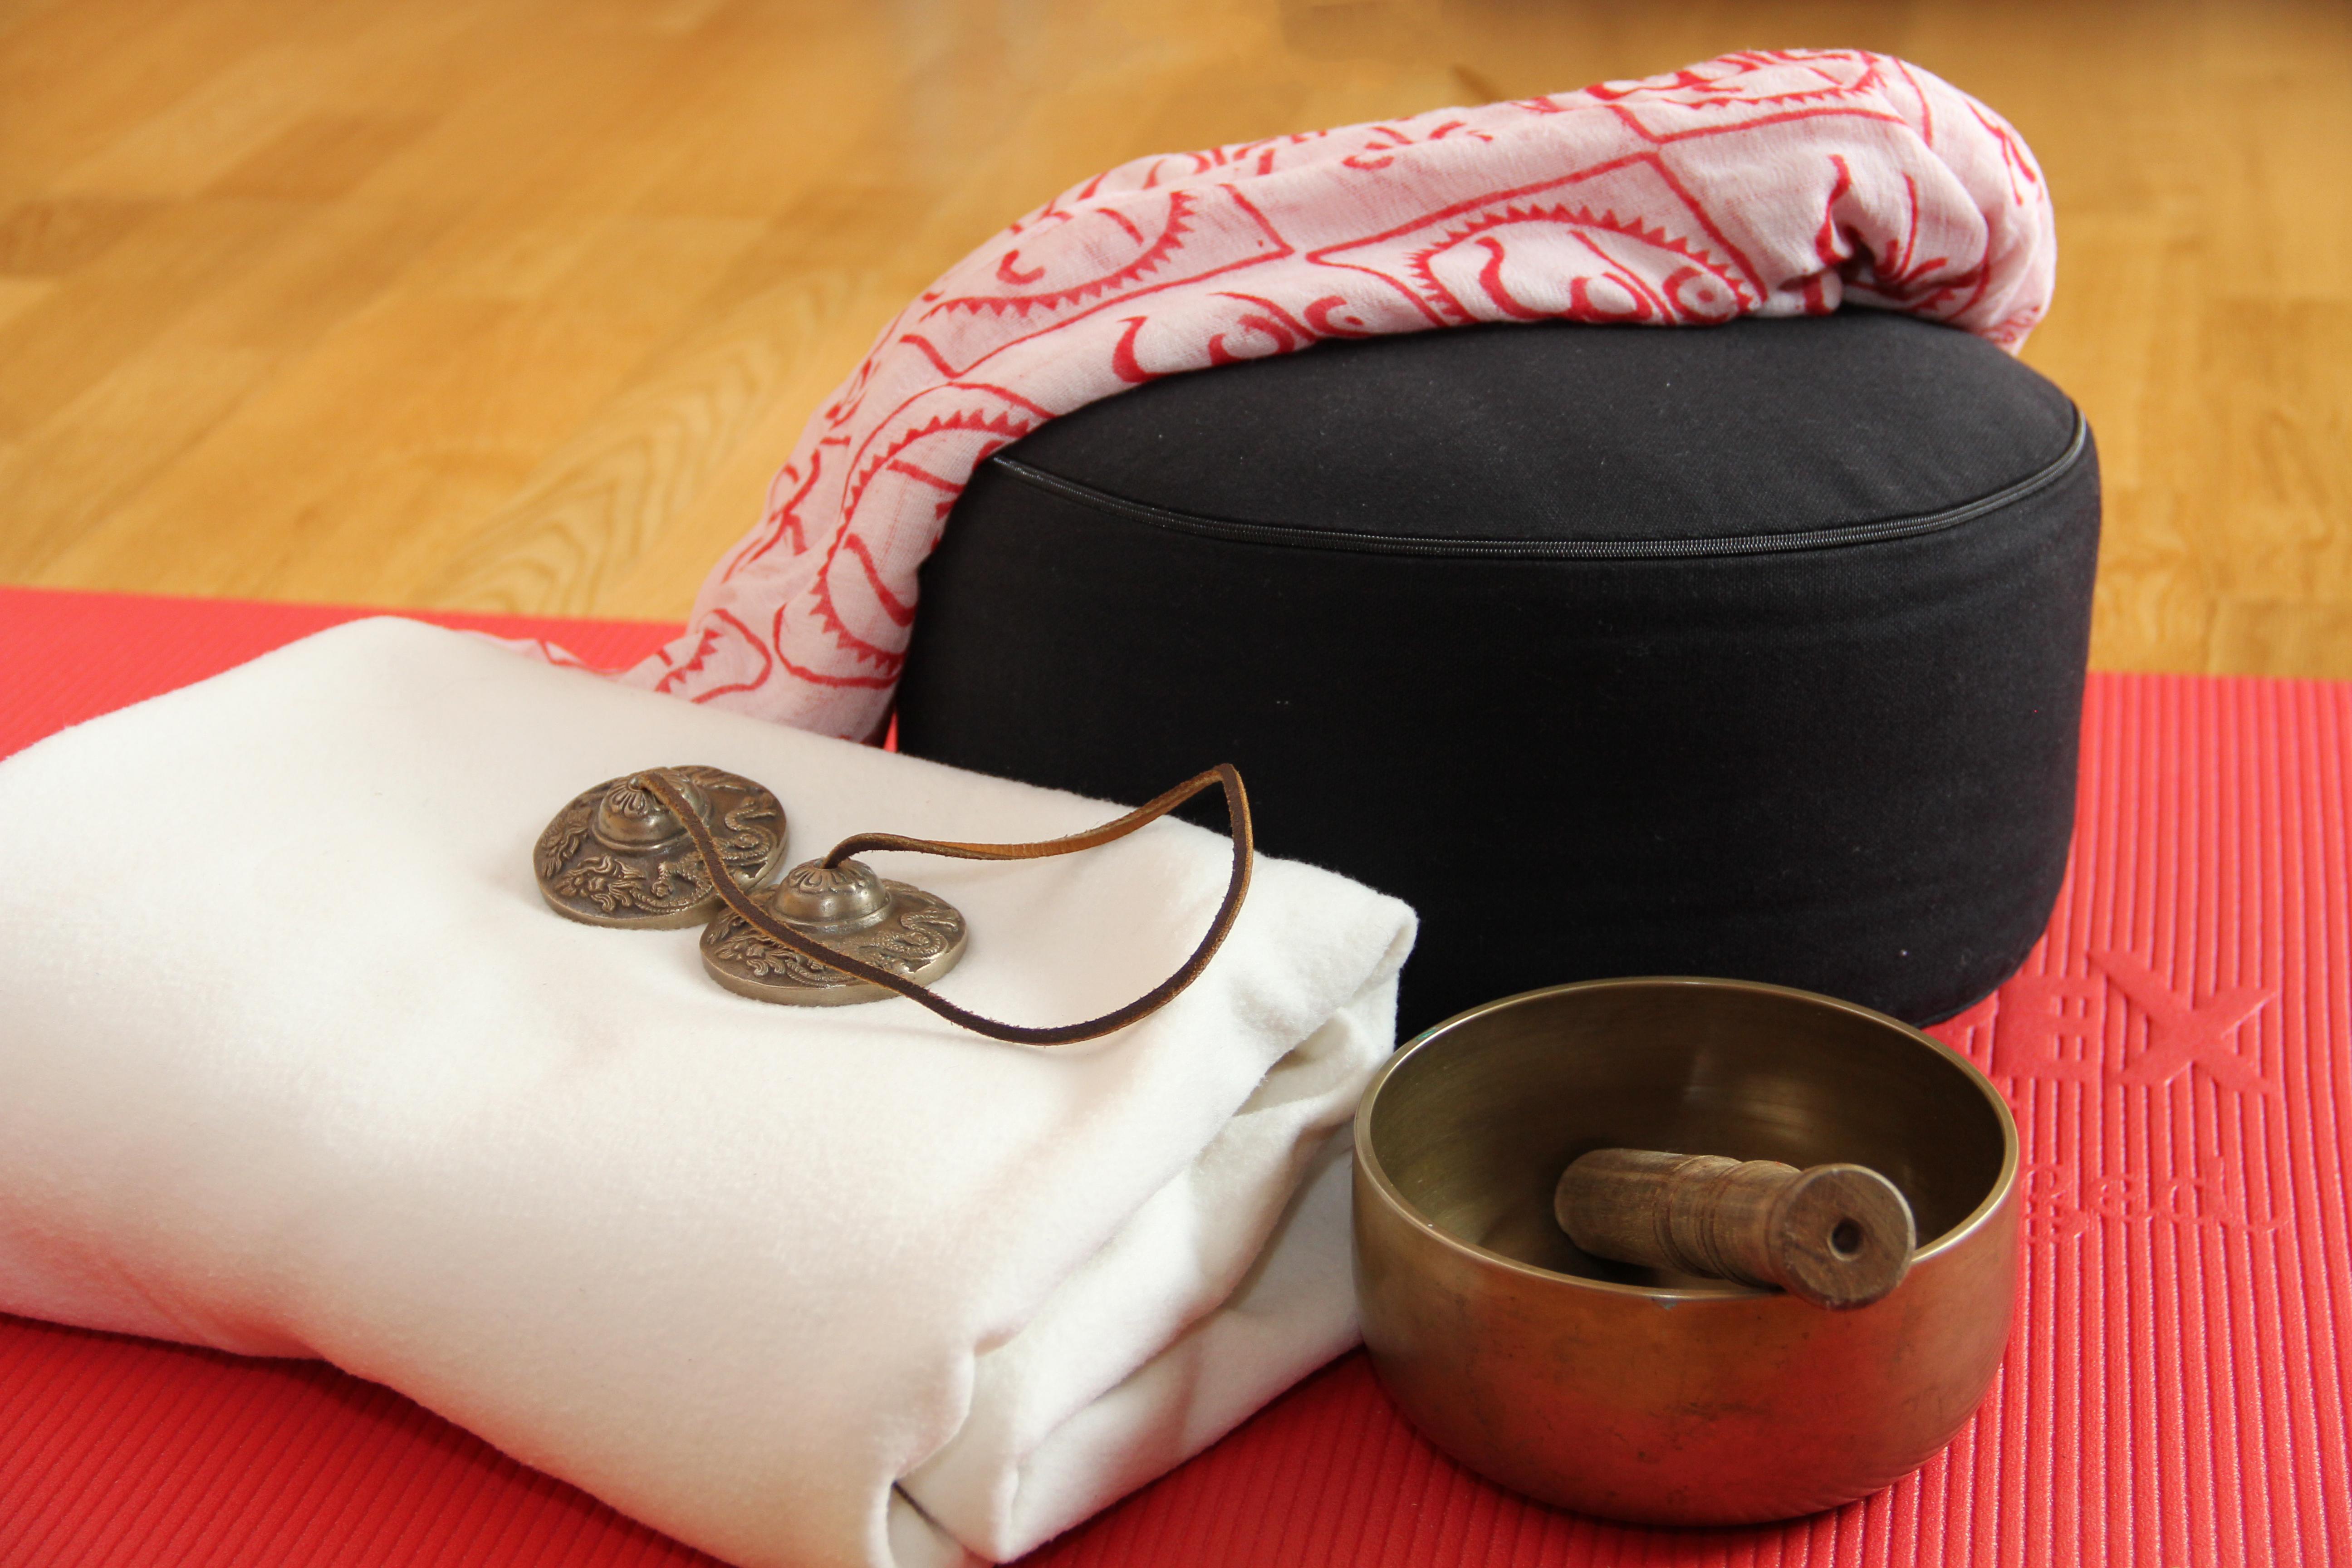 Yoga-Hilfsmittel, Sitzkissen, Decke, Zimbel, Klangschale